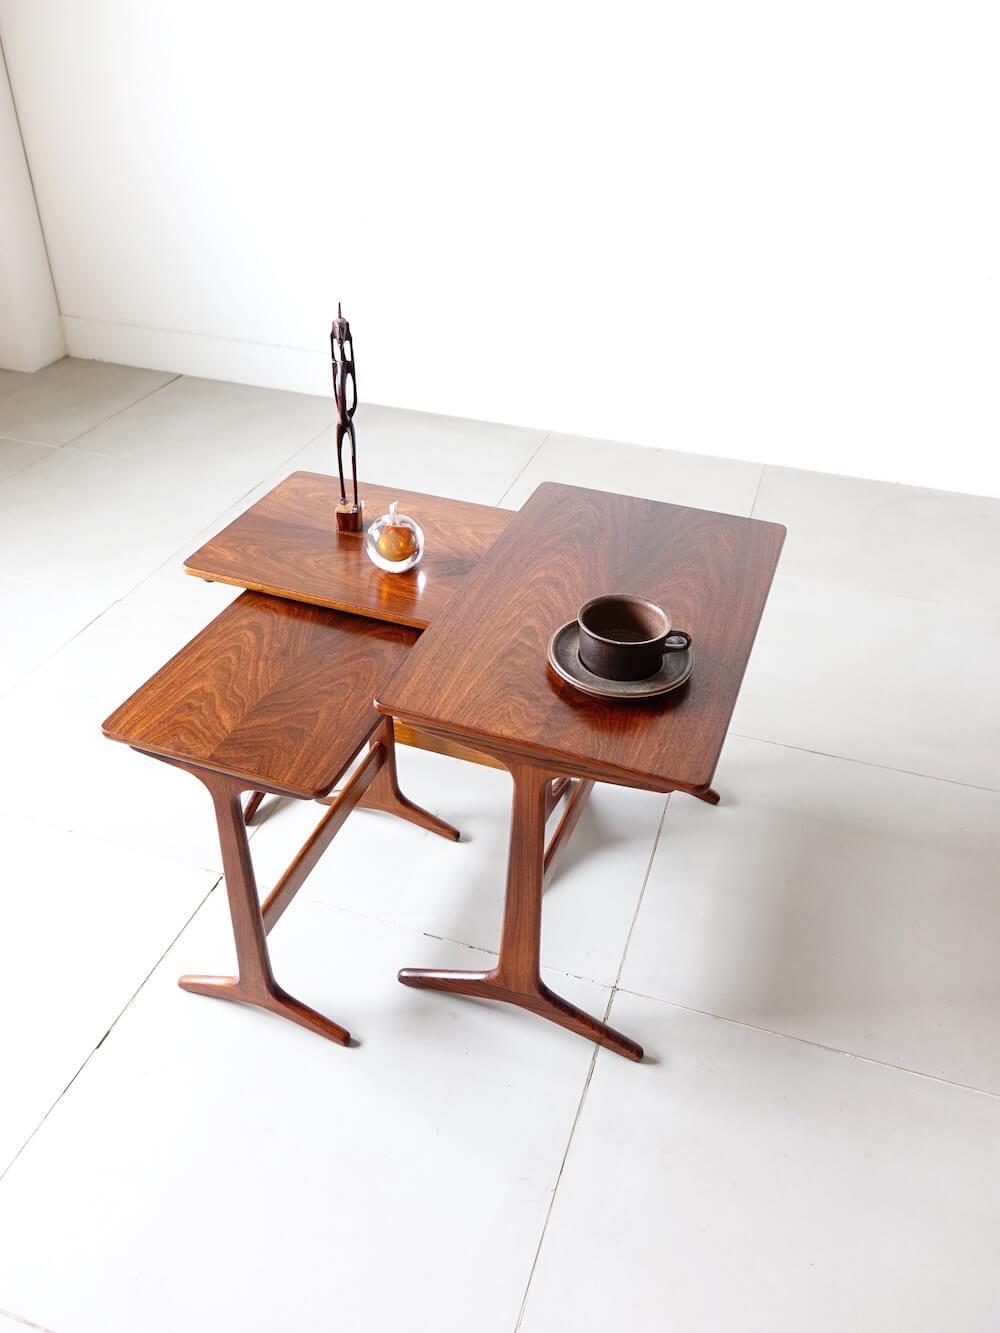 Nesting tables HM100 by Erling Torvits for Heltborg Mobler